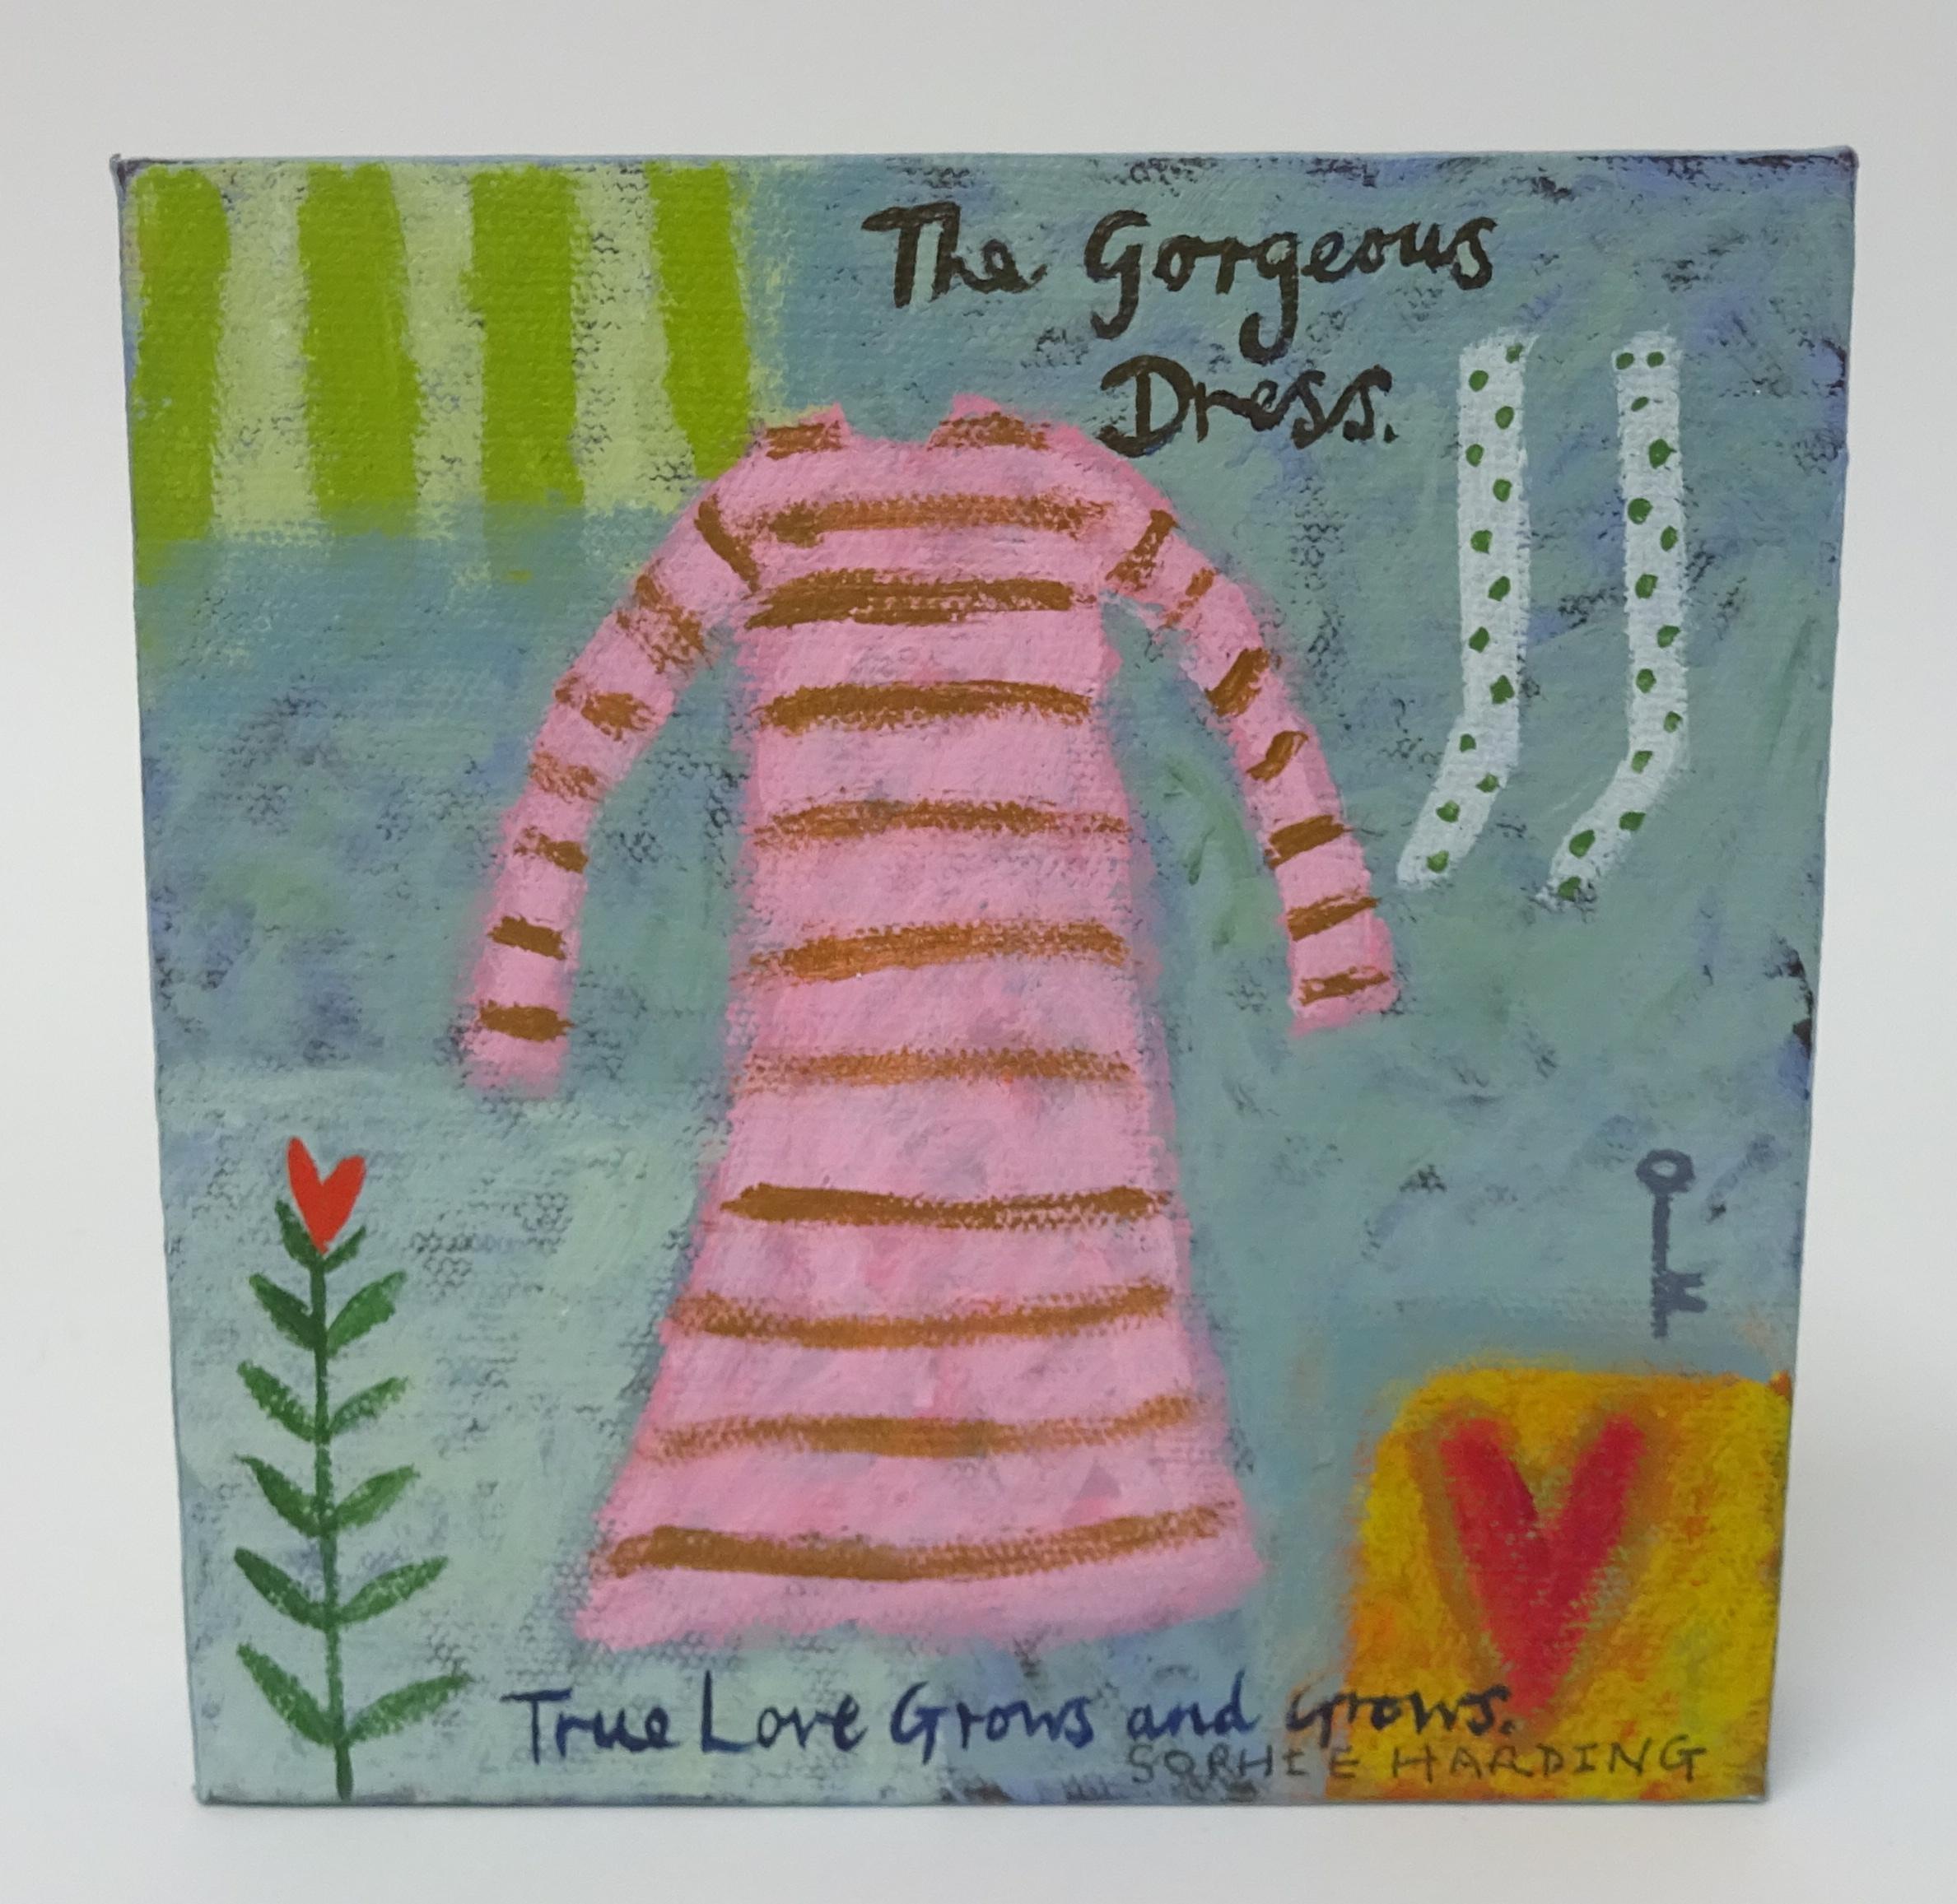 Lot 035 - Sophie Harding, miniature oil on box canvas 'The Gorgeous Dress', signed, 16cm x 15cm.